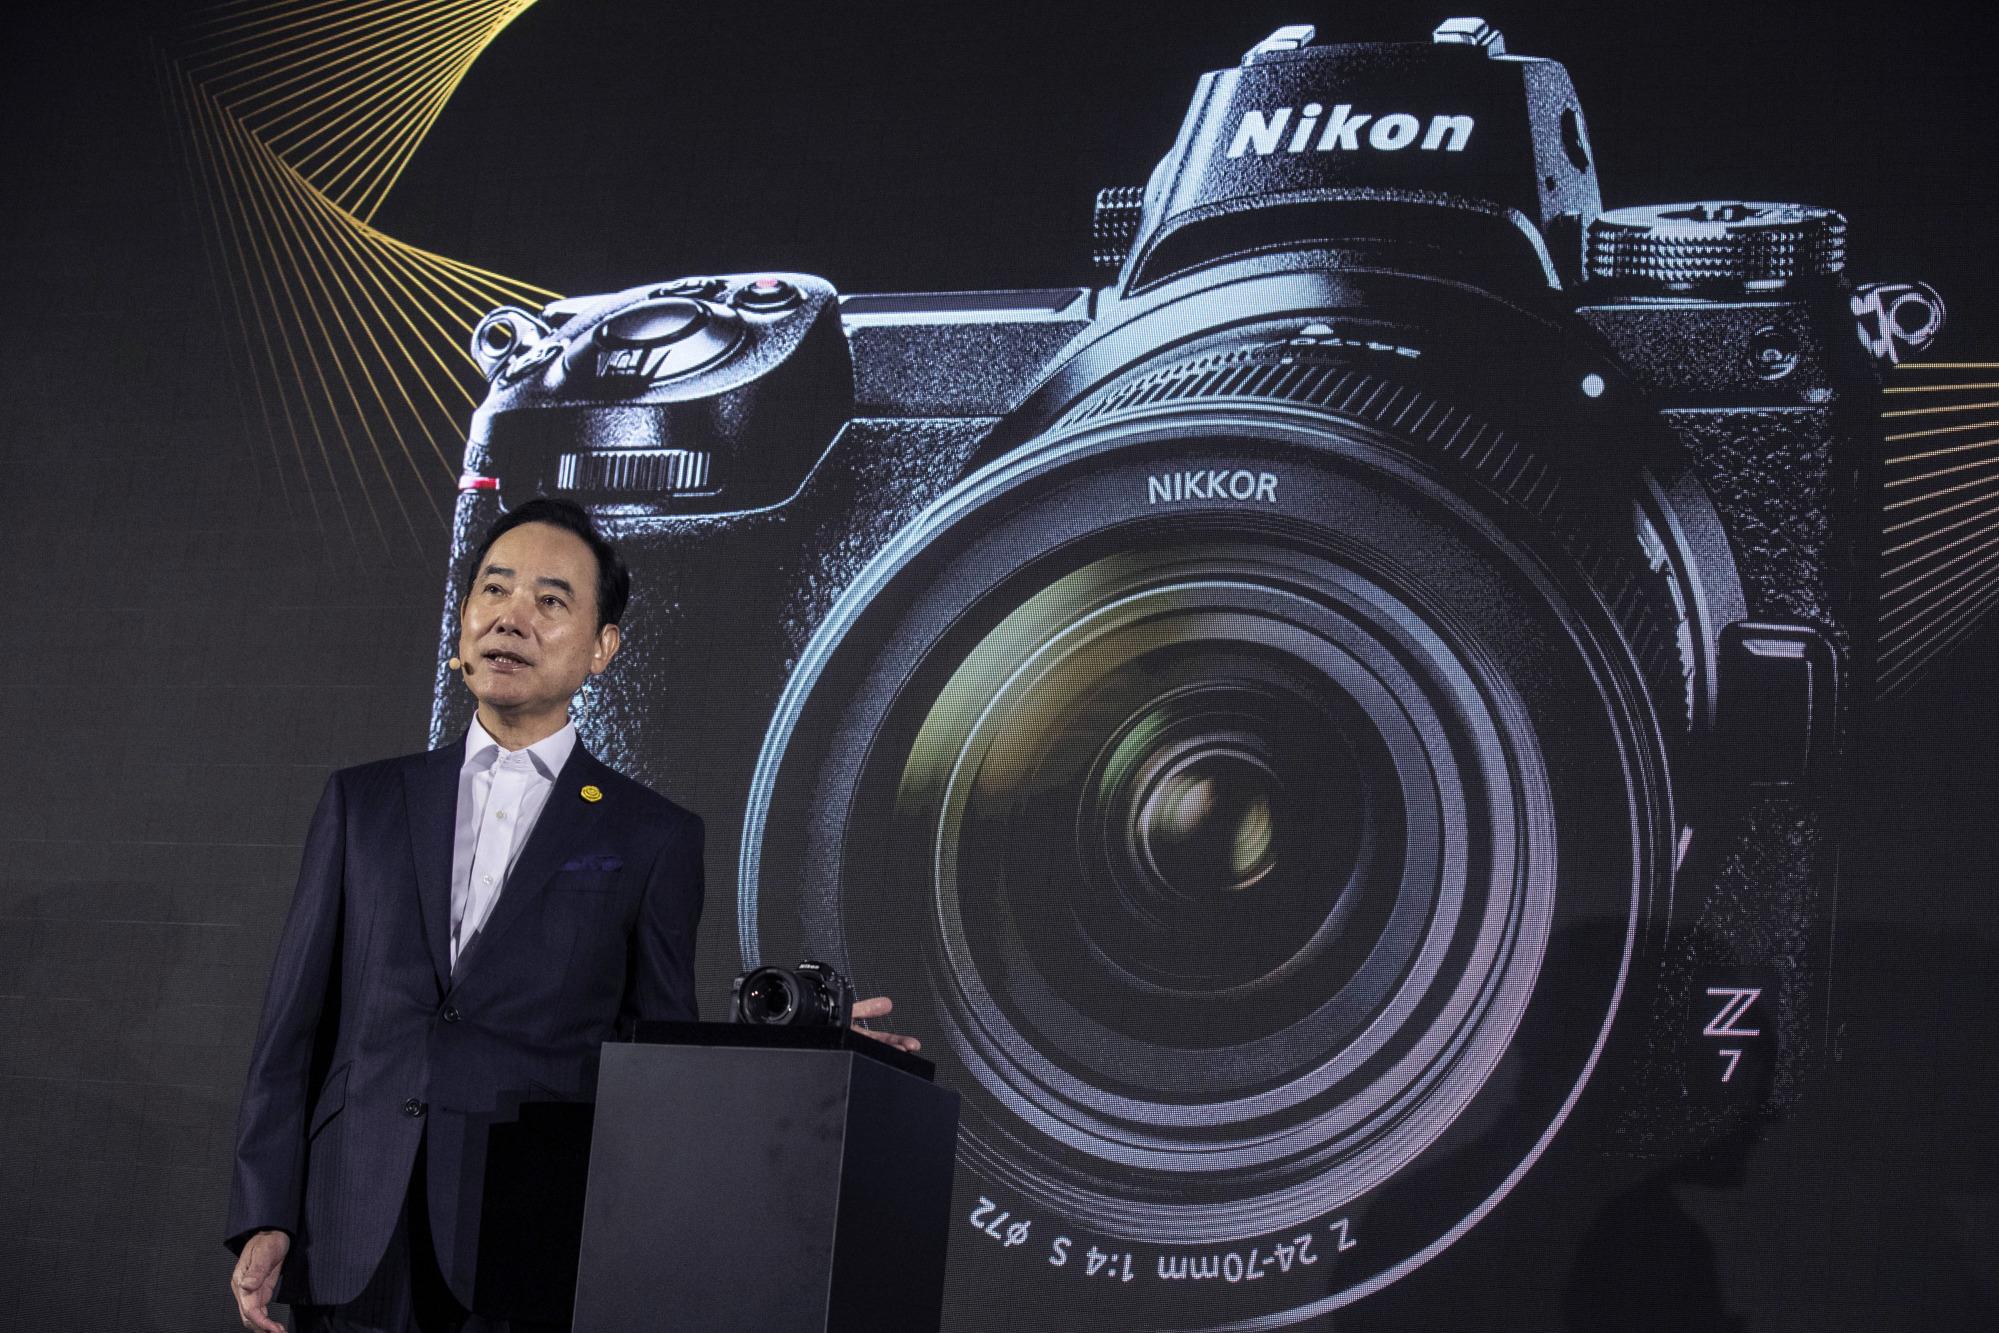 7731tokyo Stock Quote Nikon Corp Bloomberg Markets